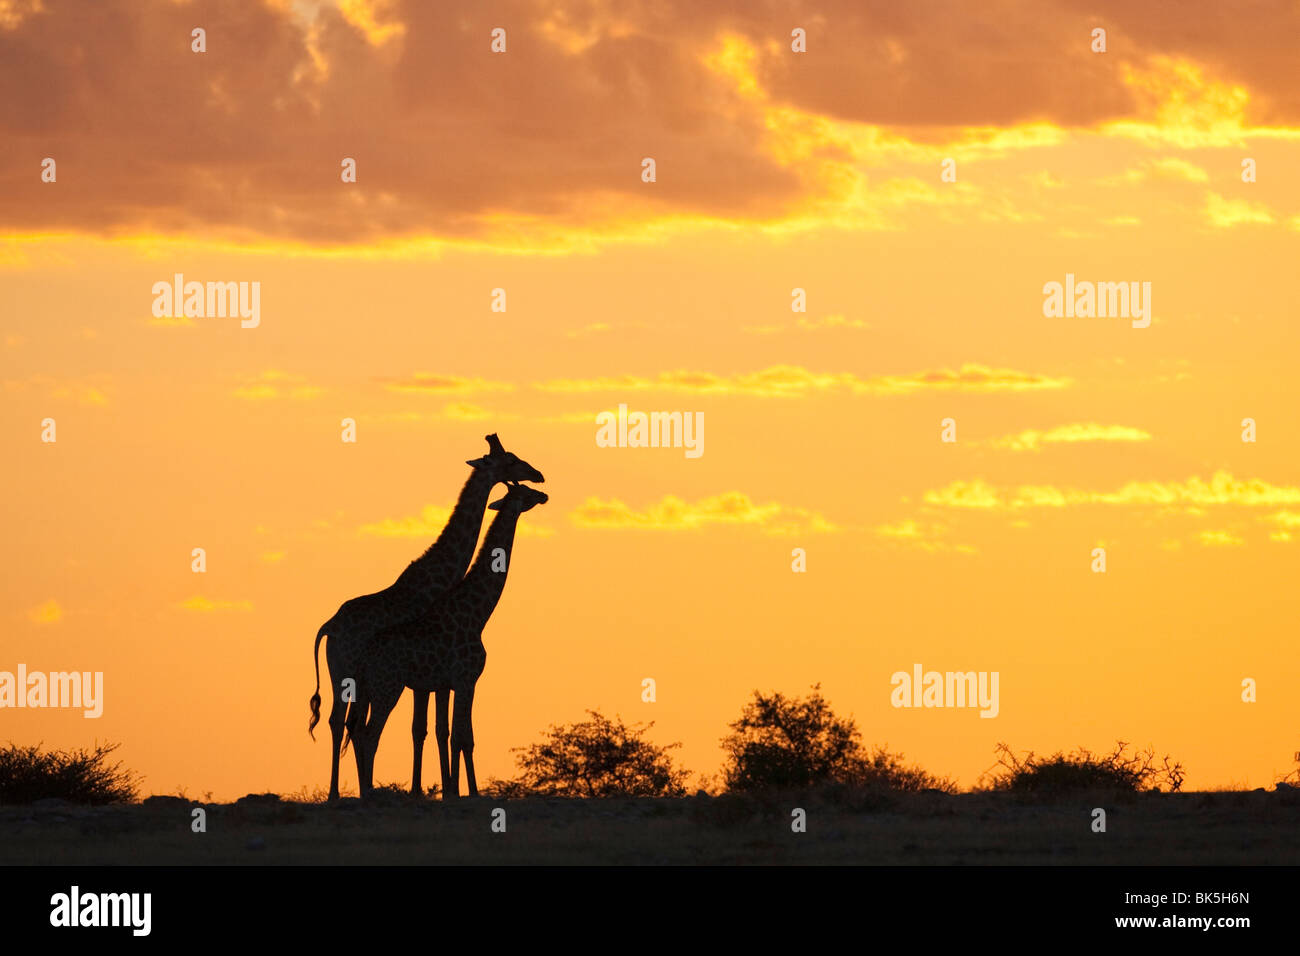 Giraffen (Giraffa Plancius), Silhouette bei Sonnenuntergang, Etosha Nationalpark, Namibia, Afrika Stockbild